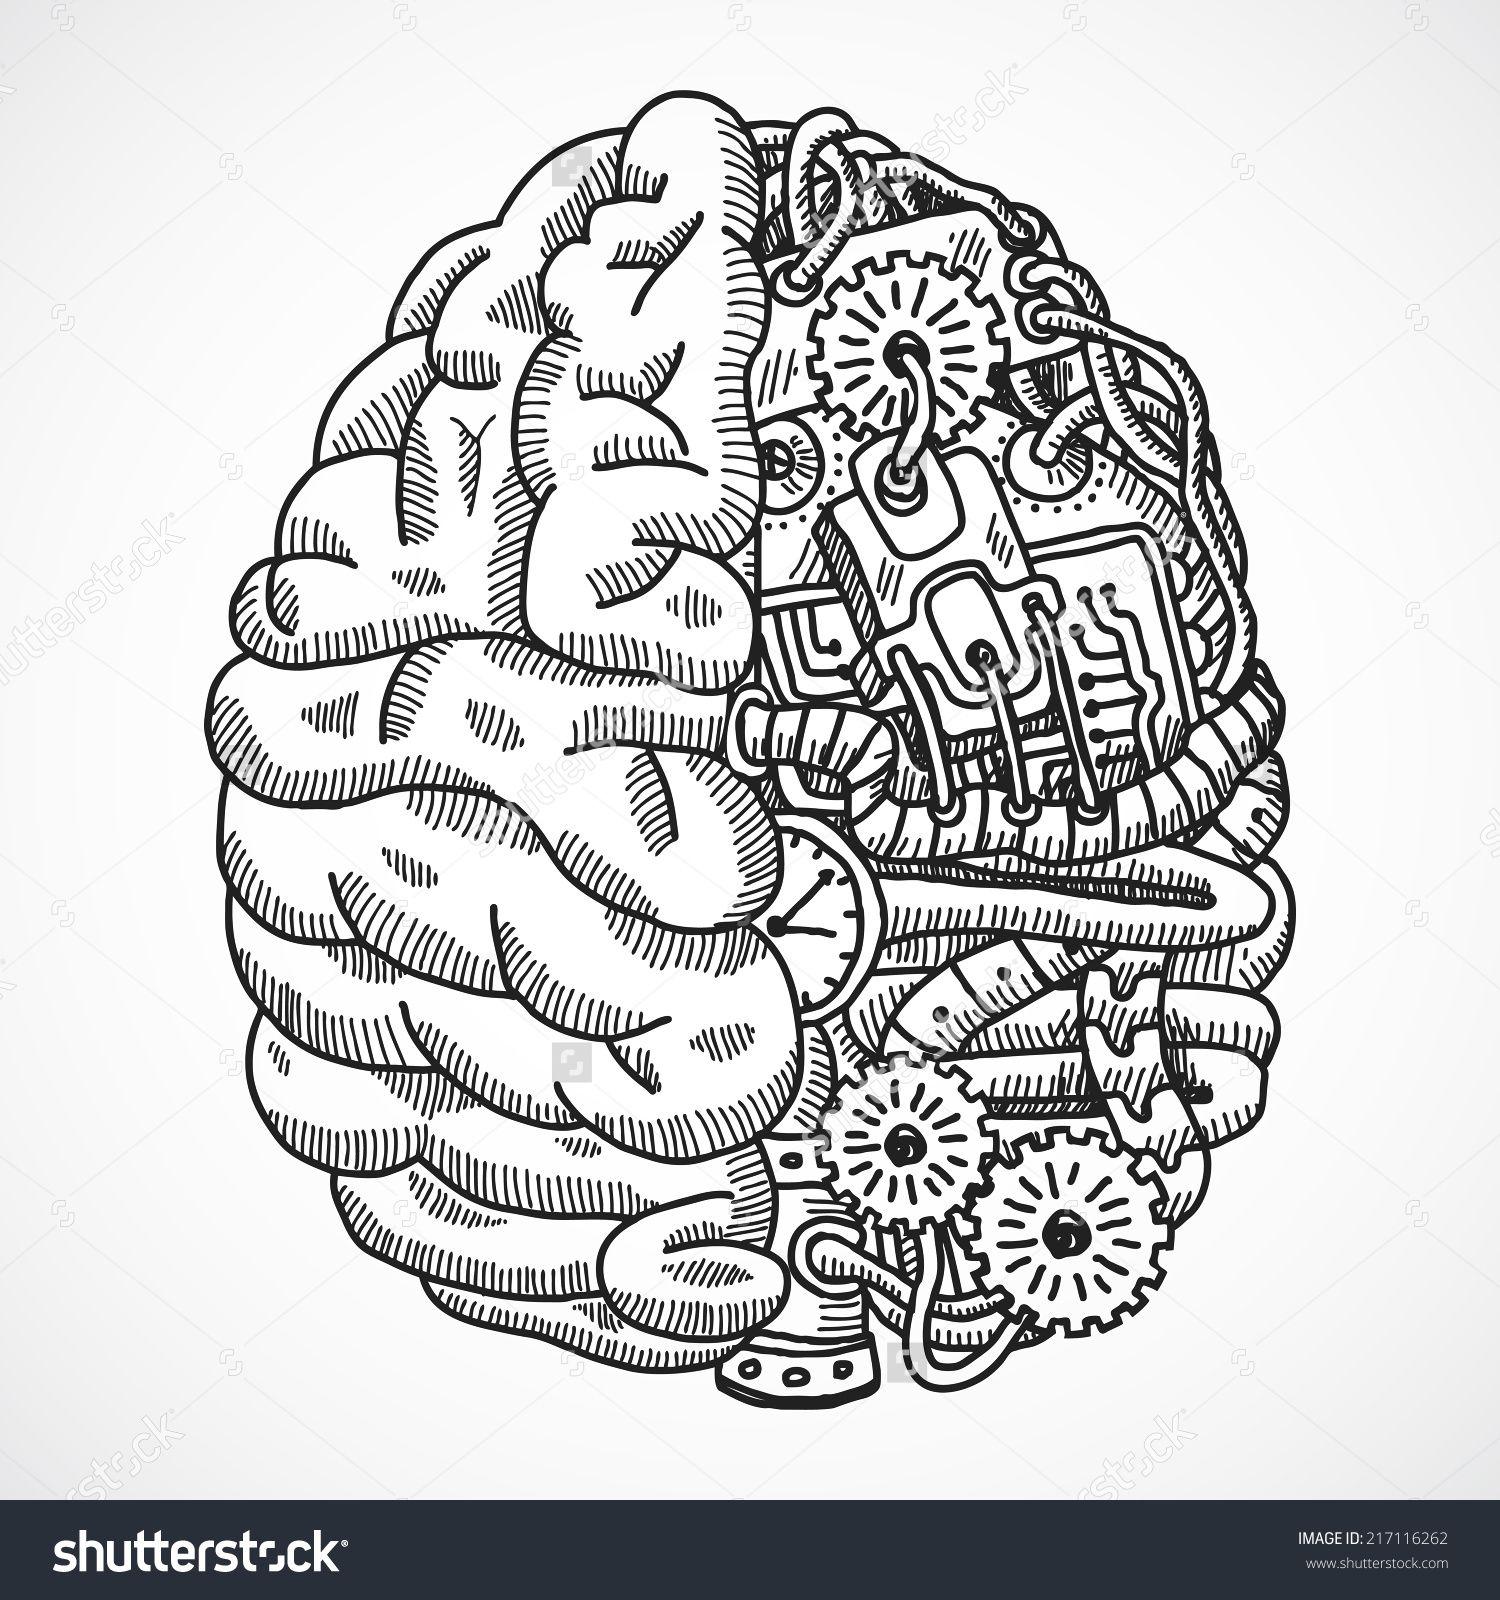 Brain clipart engineering. Human as processing machine